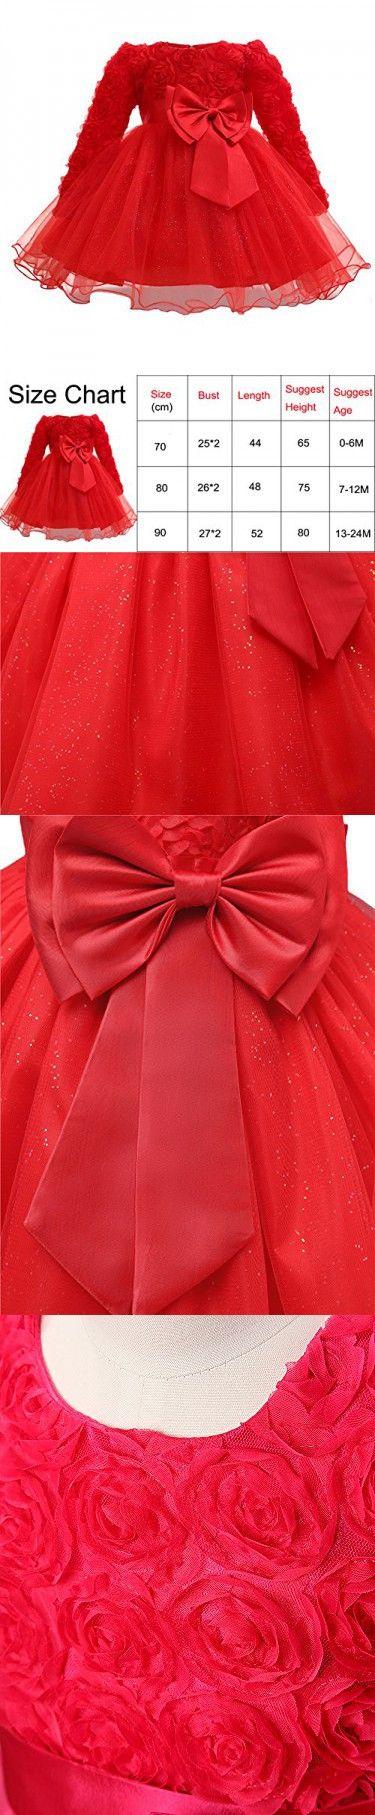 e0534ca977eb Myosotis510 Girls  Lace Princess Wedding Baptism Dress Long Sleeve ...